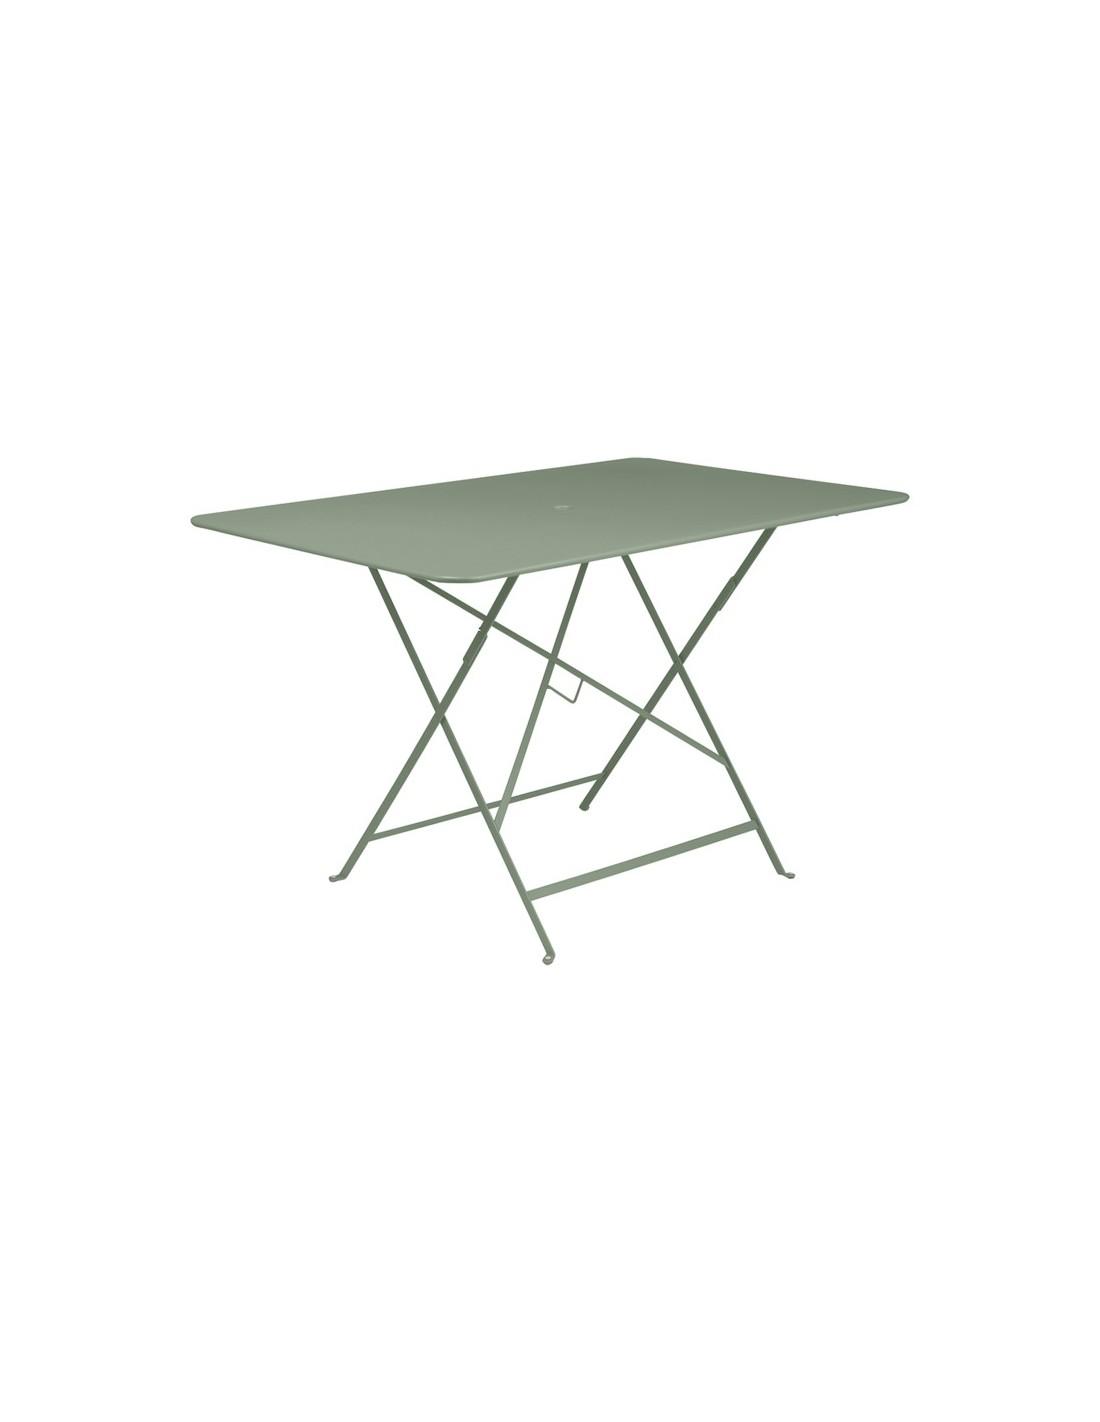 table pliante m tal rectangle 117x57cm bistro 6 places fermob. Black Bedroom Furniture Sets. Home Design Ideas